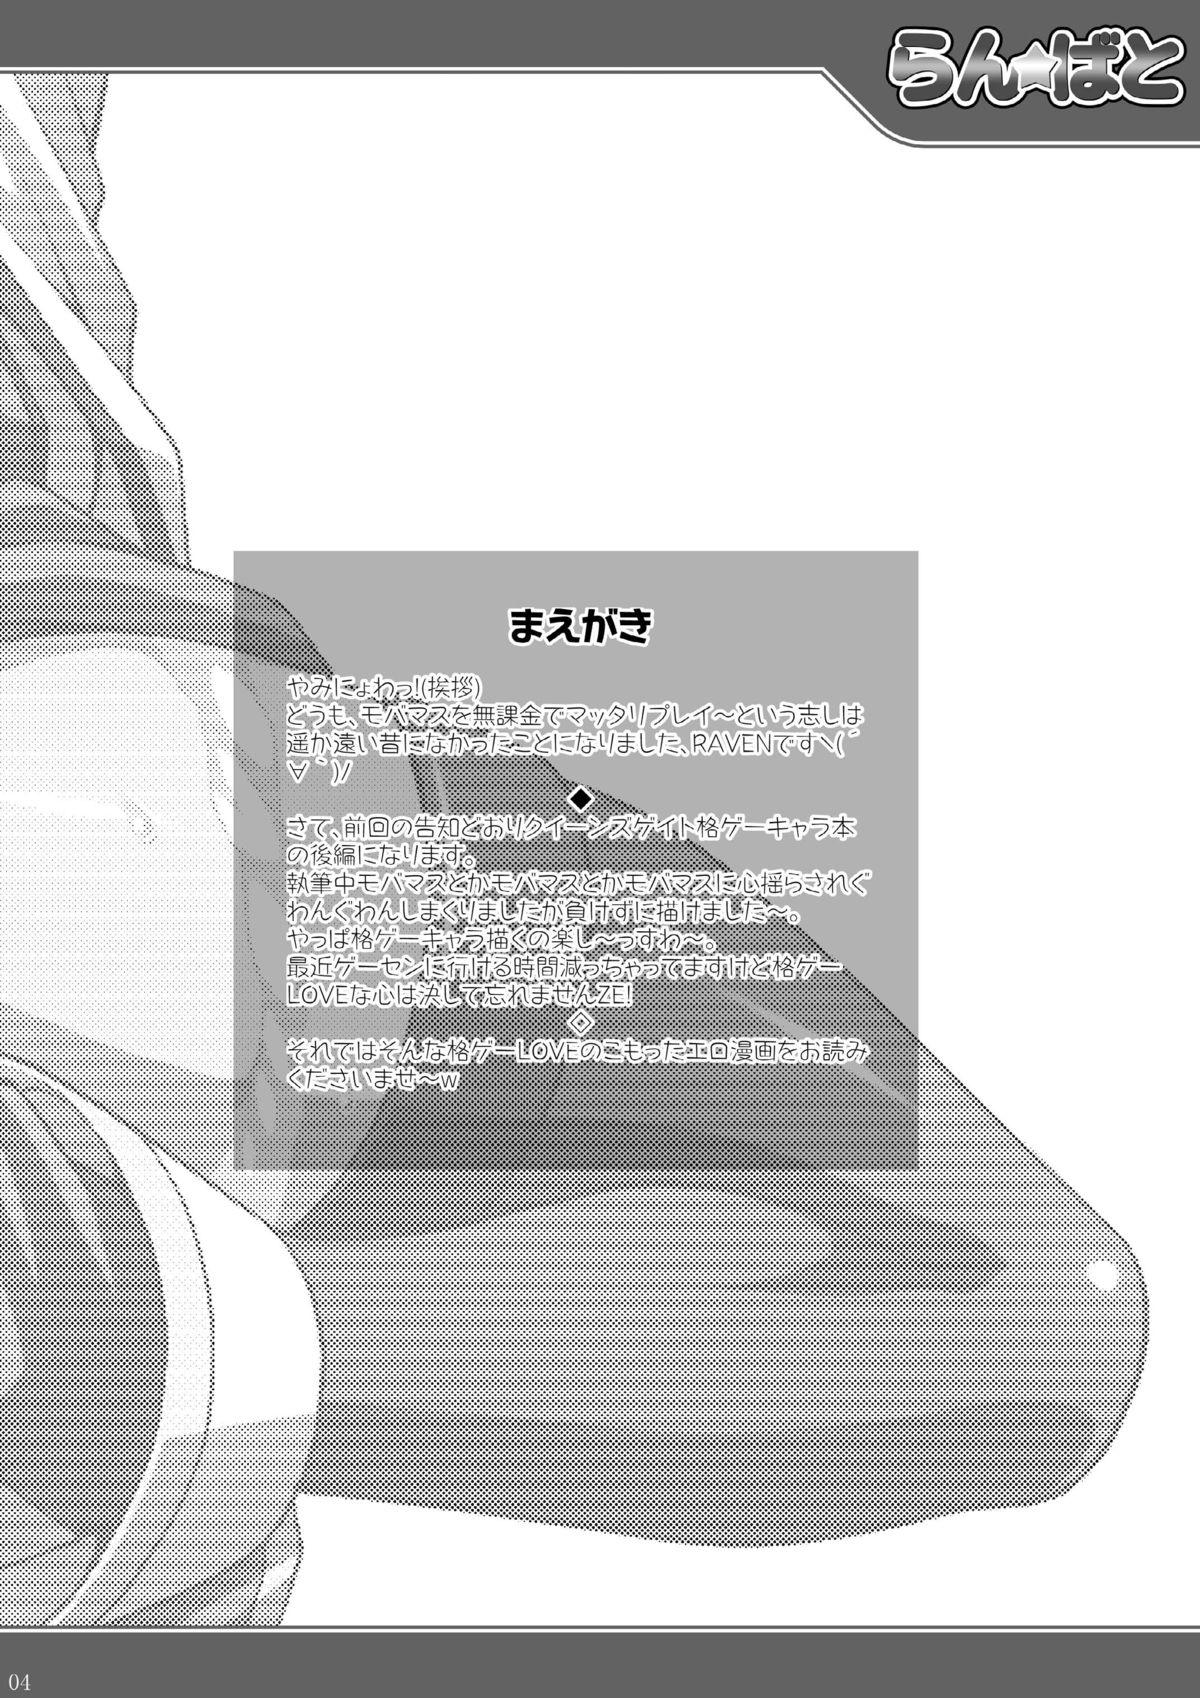 Ran ☆ Bato - Round 2 3